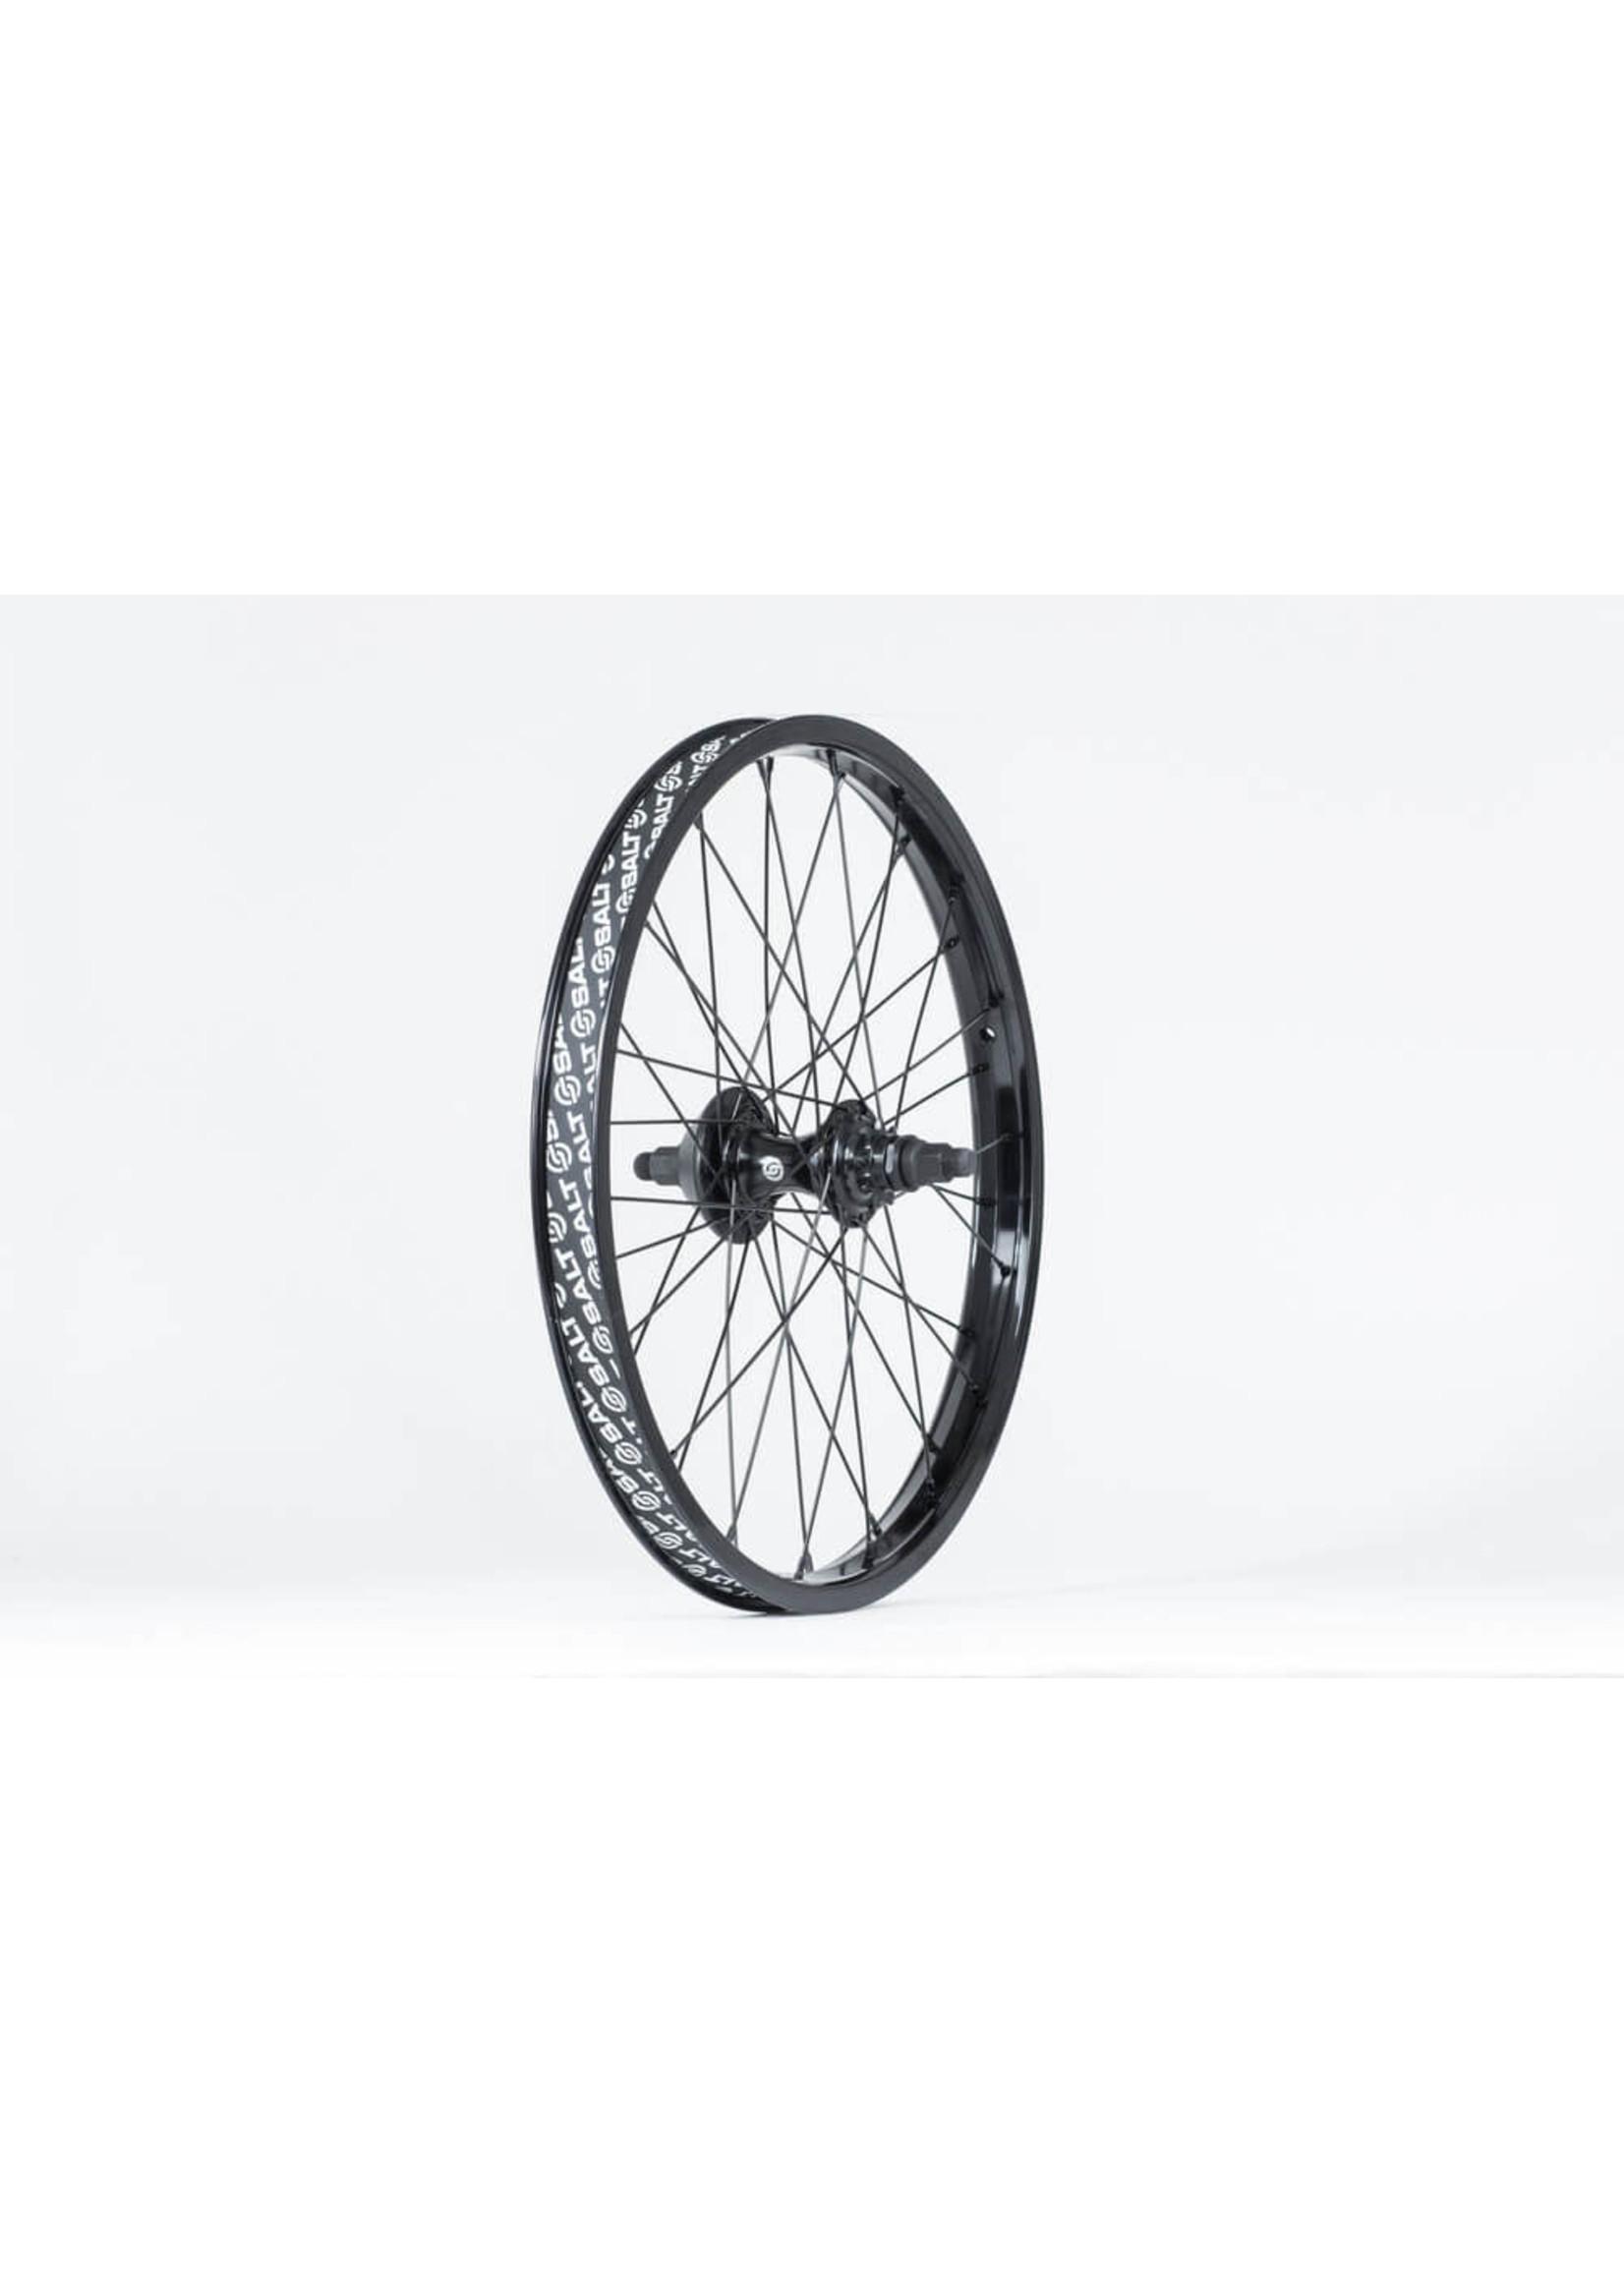 Salt Salt Plus - Summit Rear Wheel w/ Guards - RHD